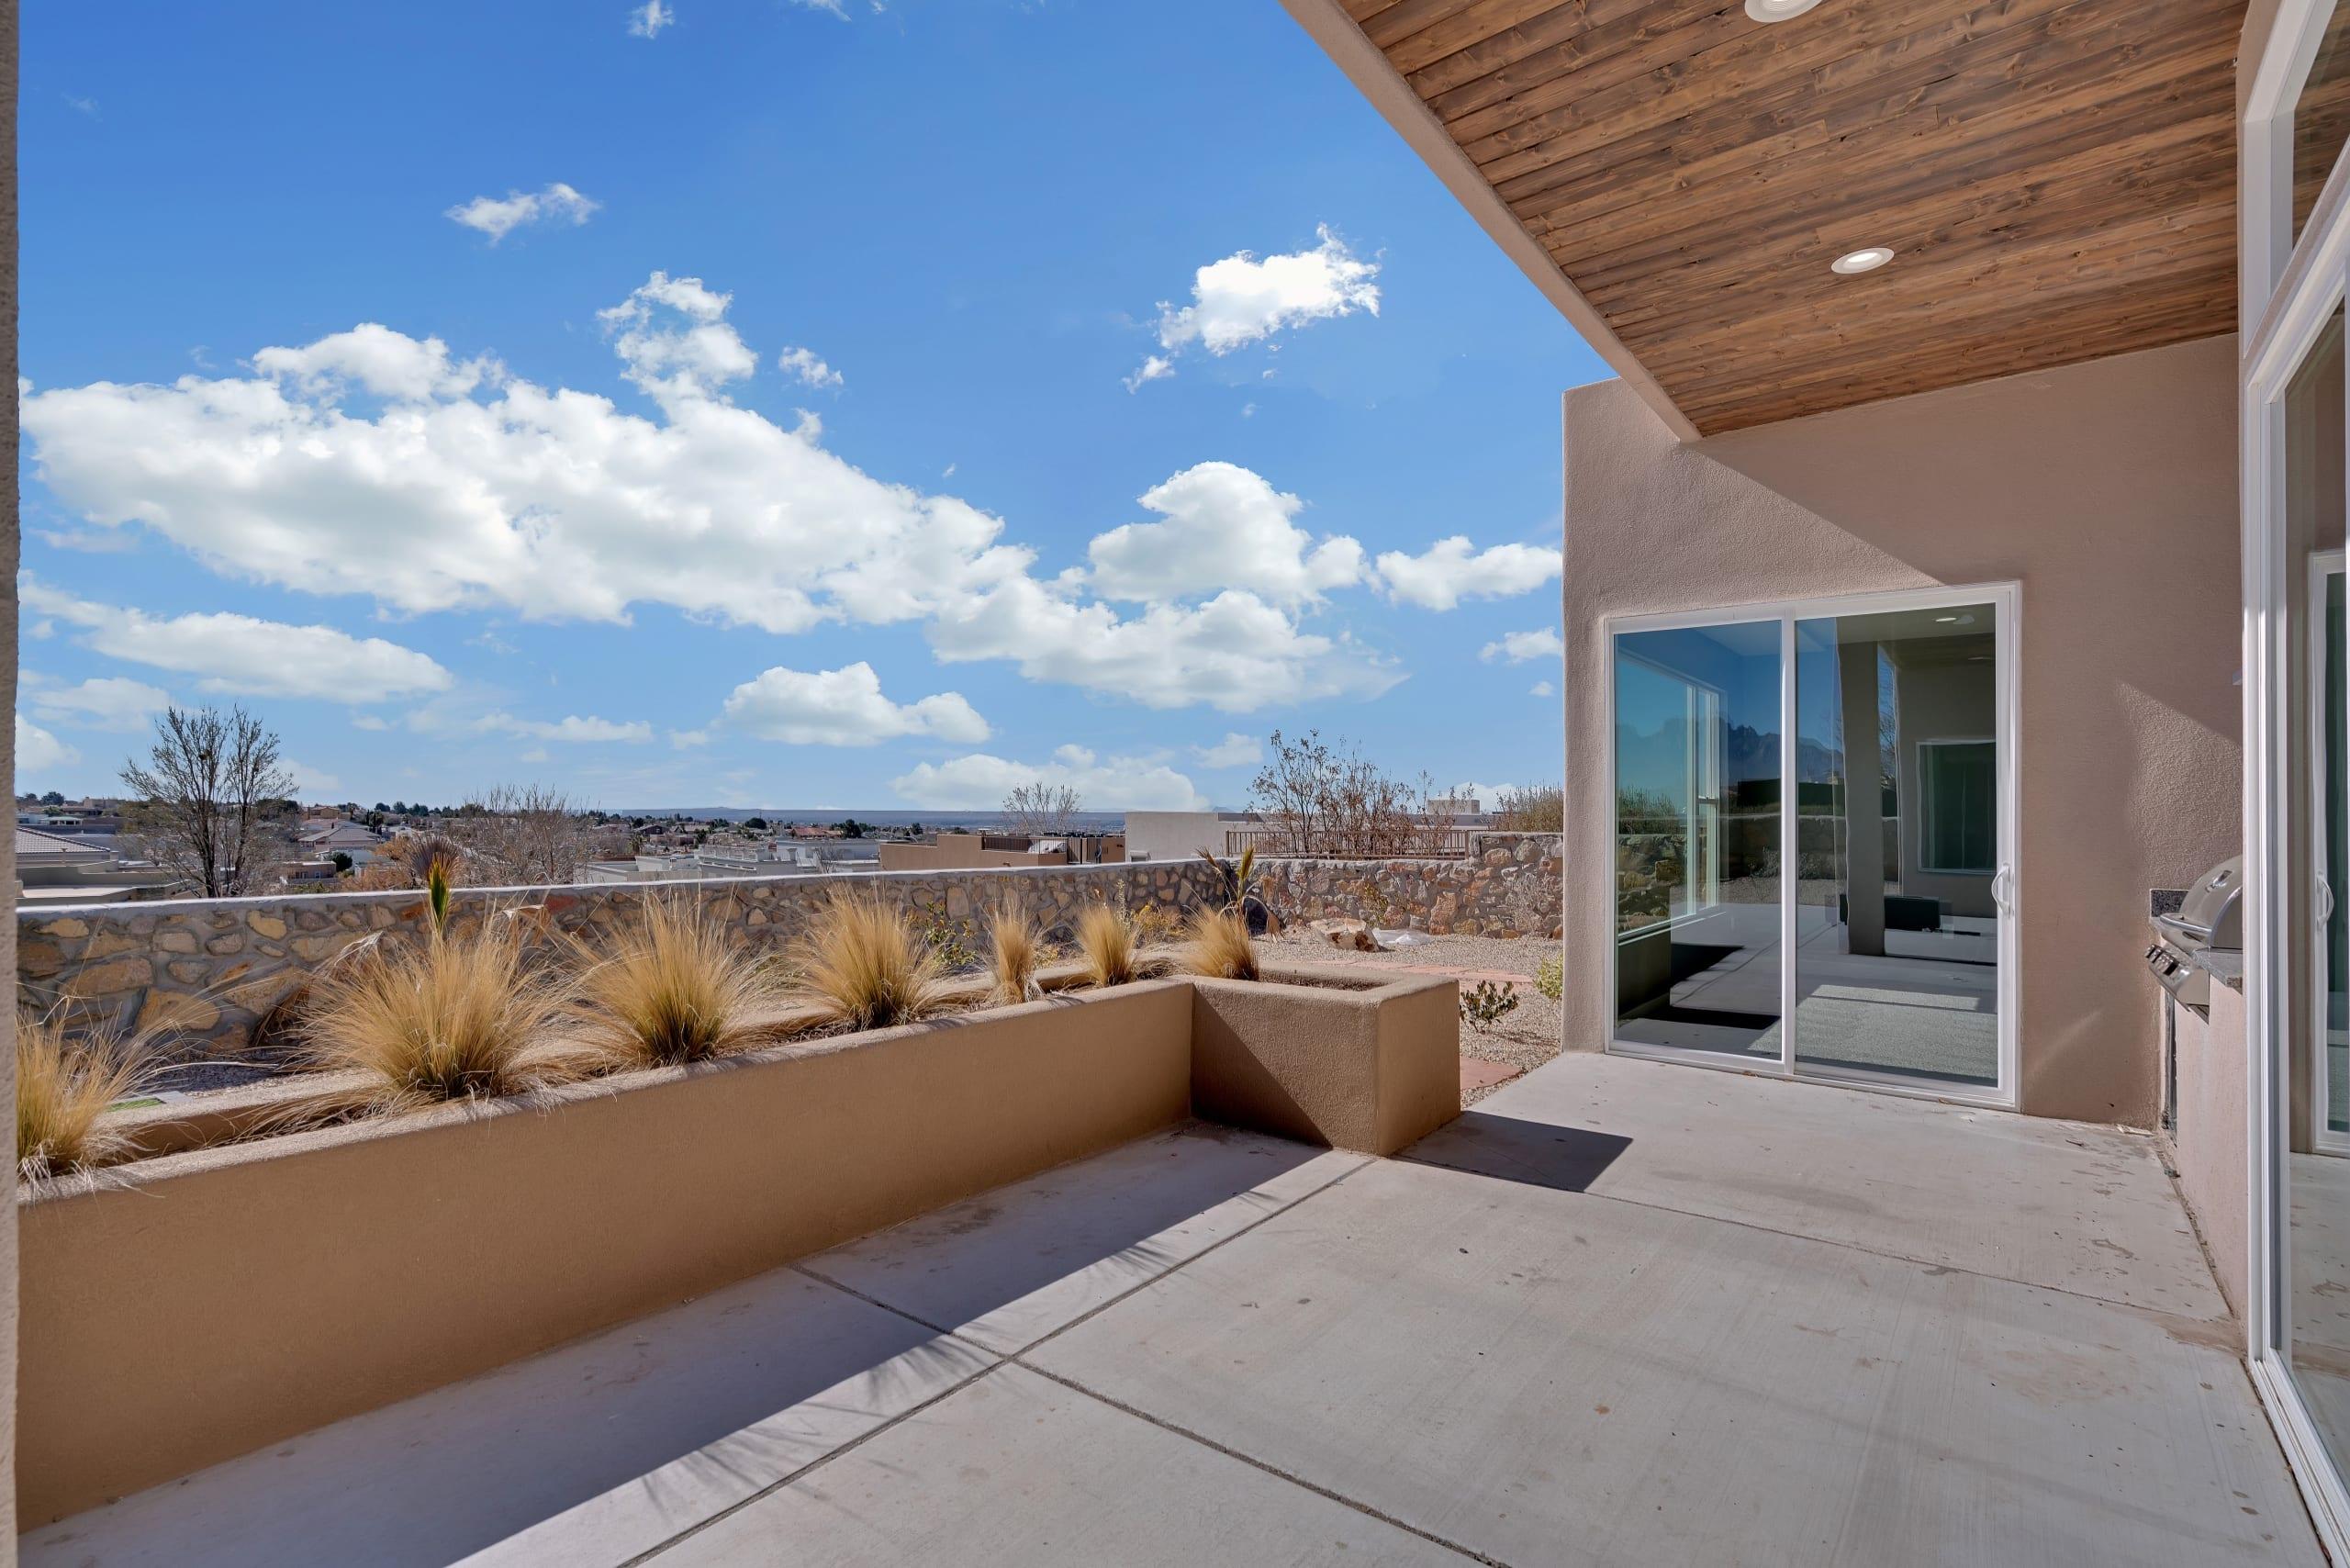 2914 East Spring Backyard - Facing Southwest - Patio view facing southwest